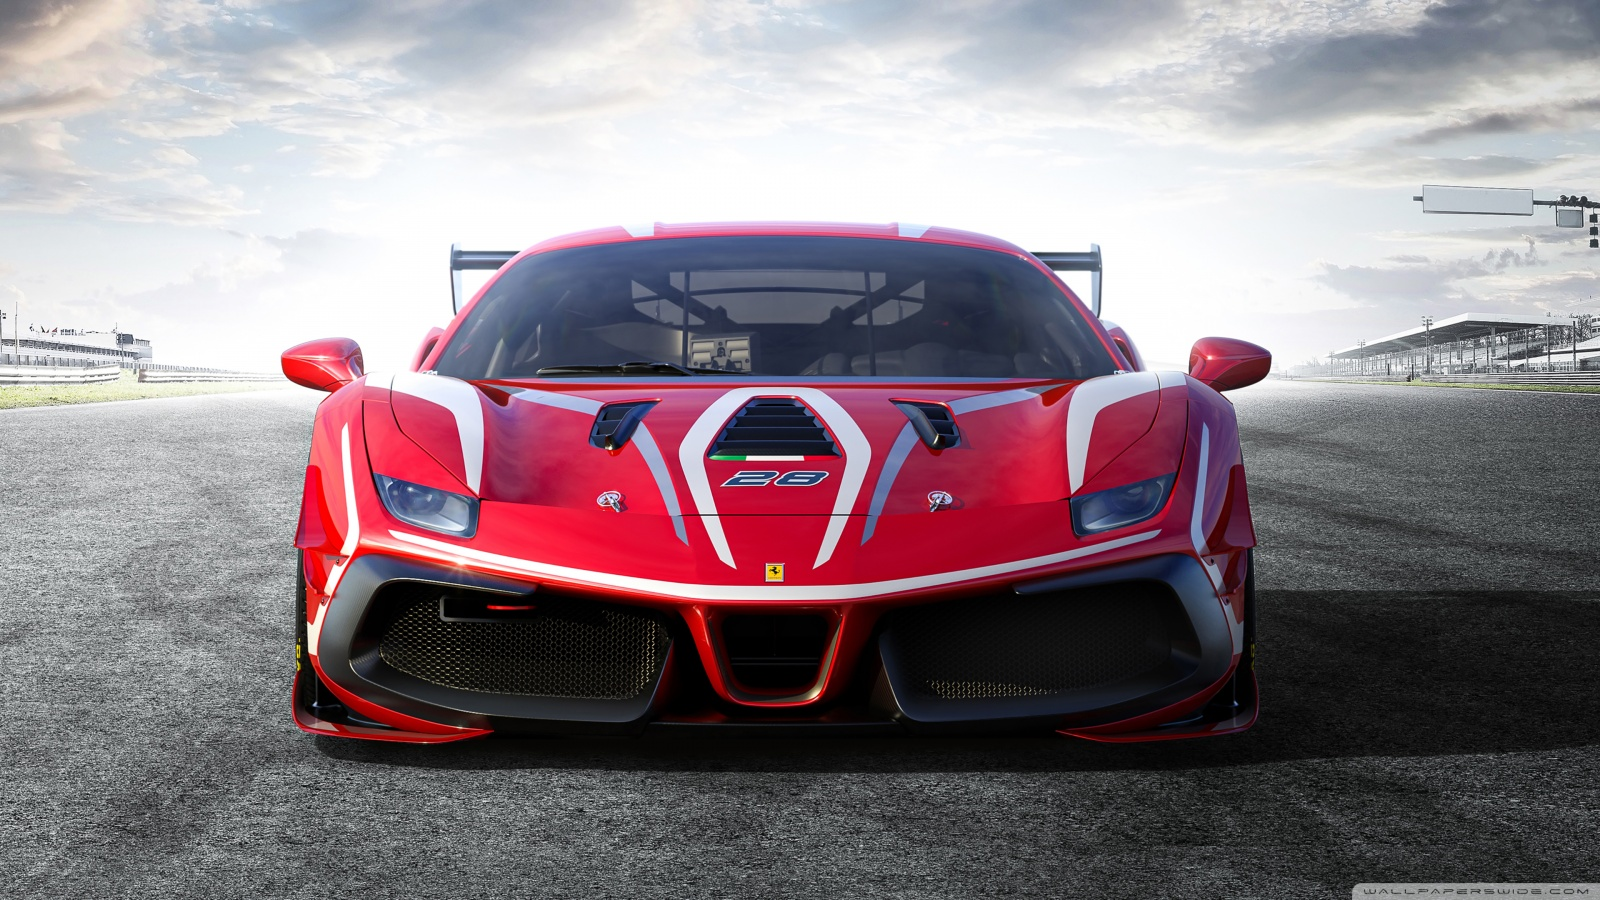 Ferrari 488 Challenge Evo Race Car 2020 Ultra HD Desktop 1600x900